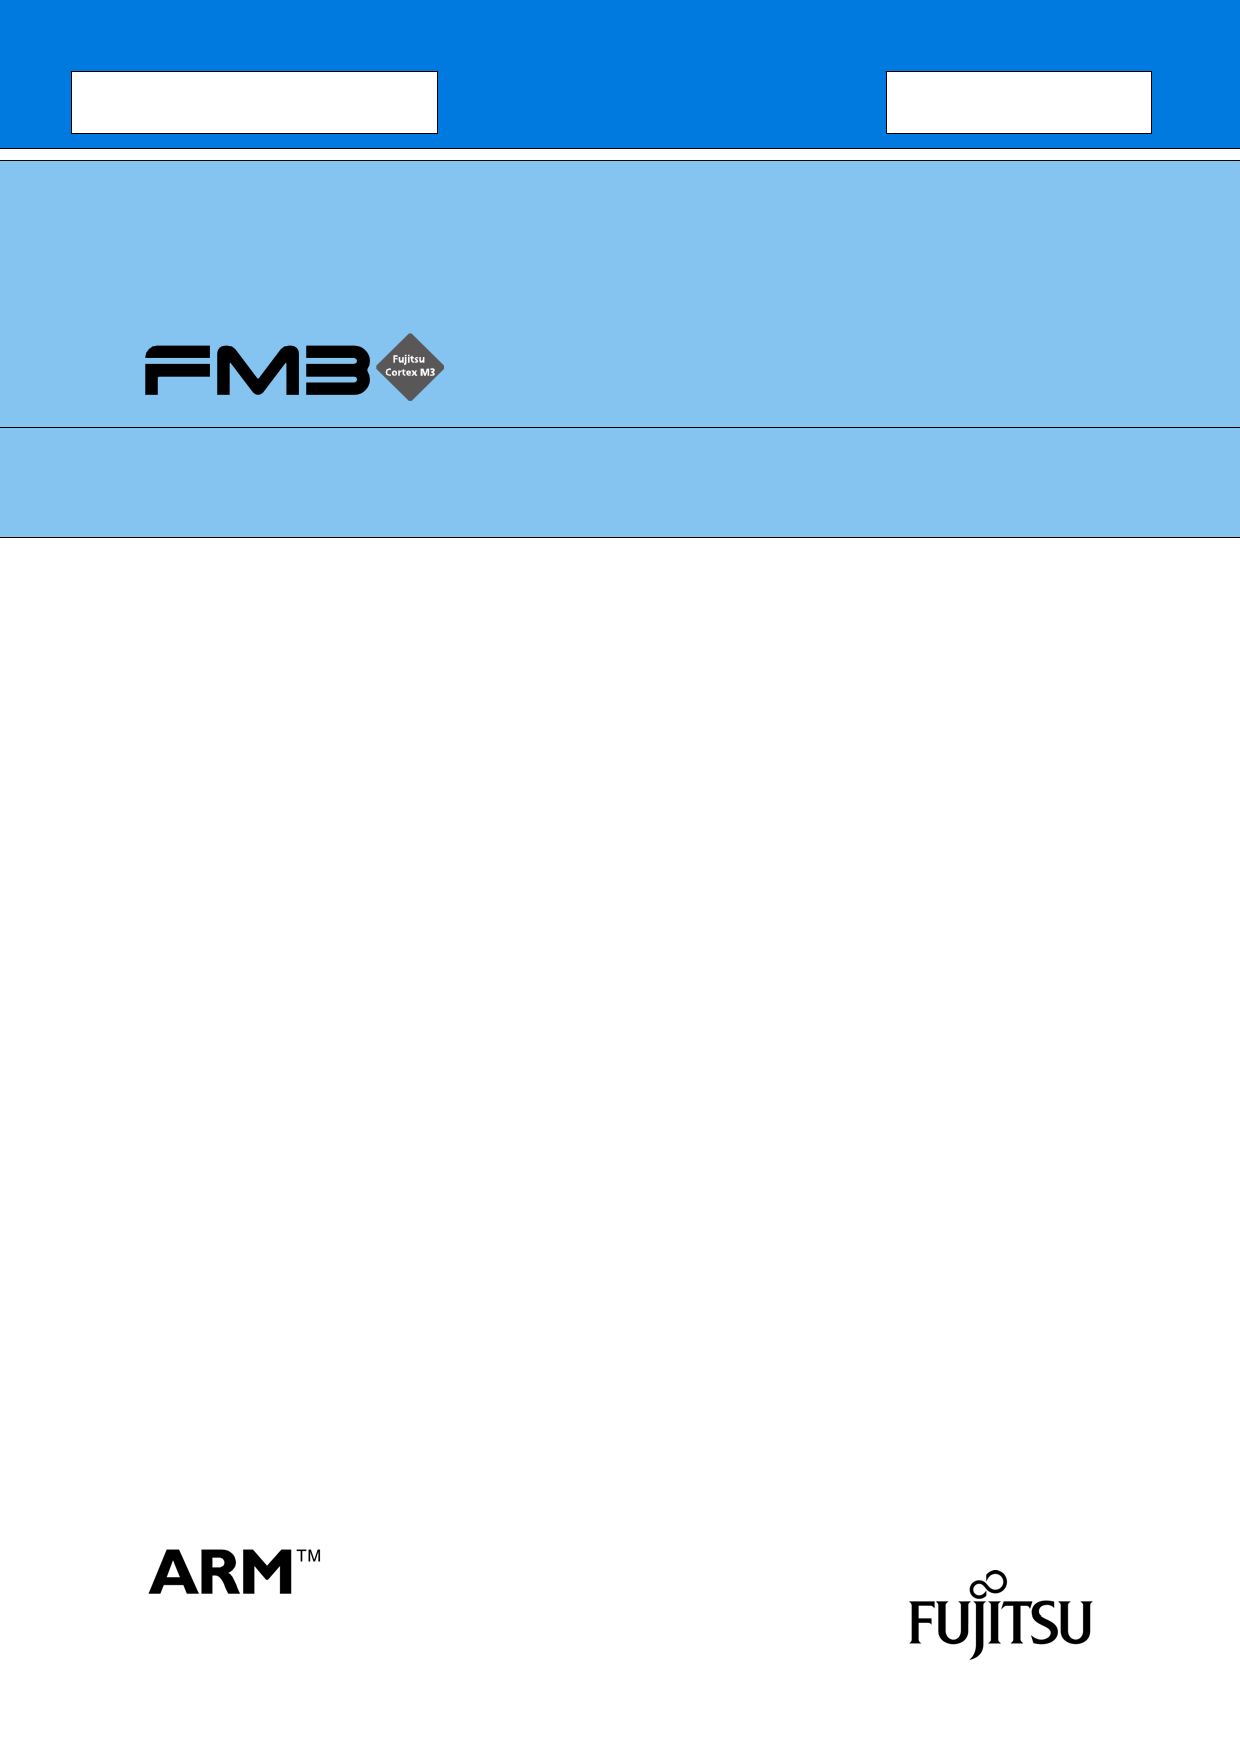 MB9BF322L 데이터시트 및 MB9BF322L PDF